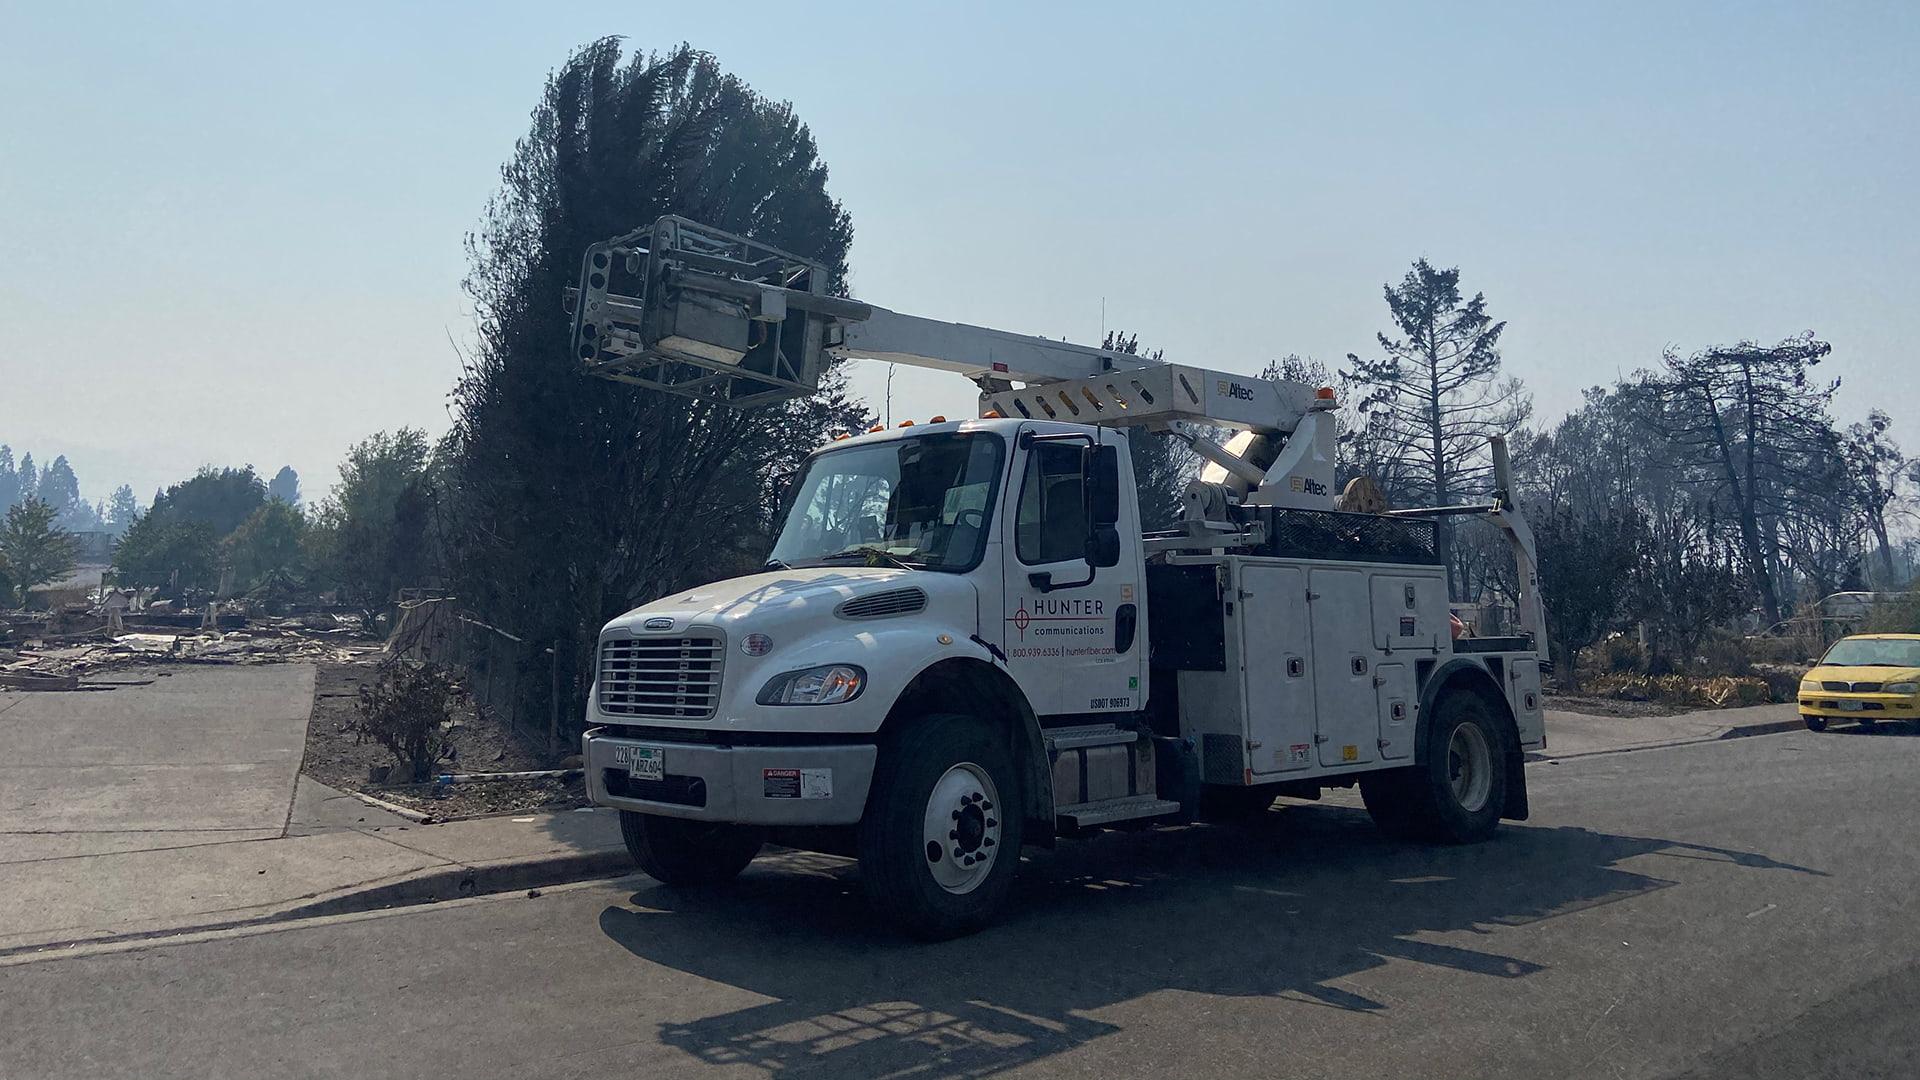 Hunter Communications service truck